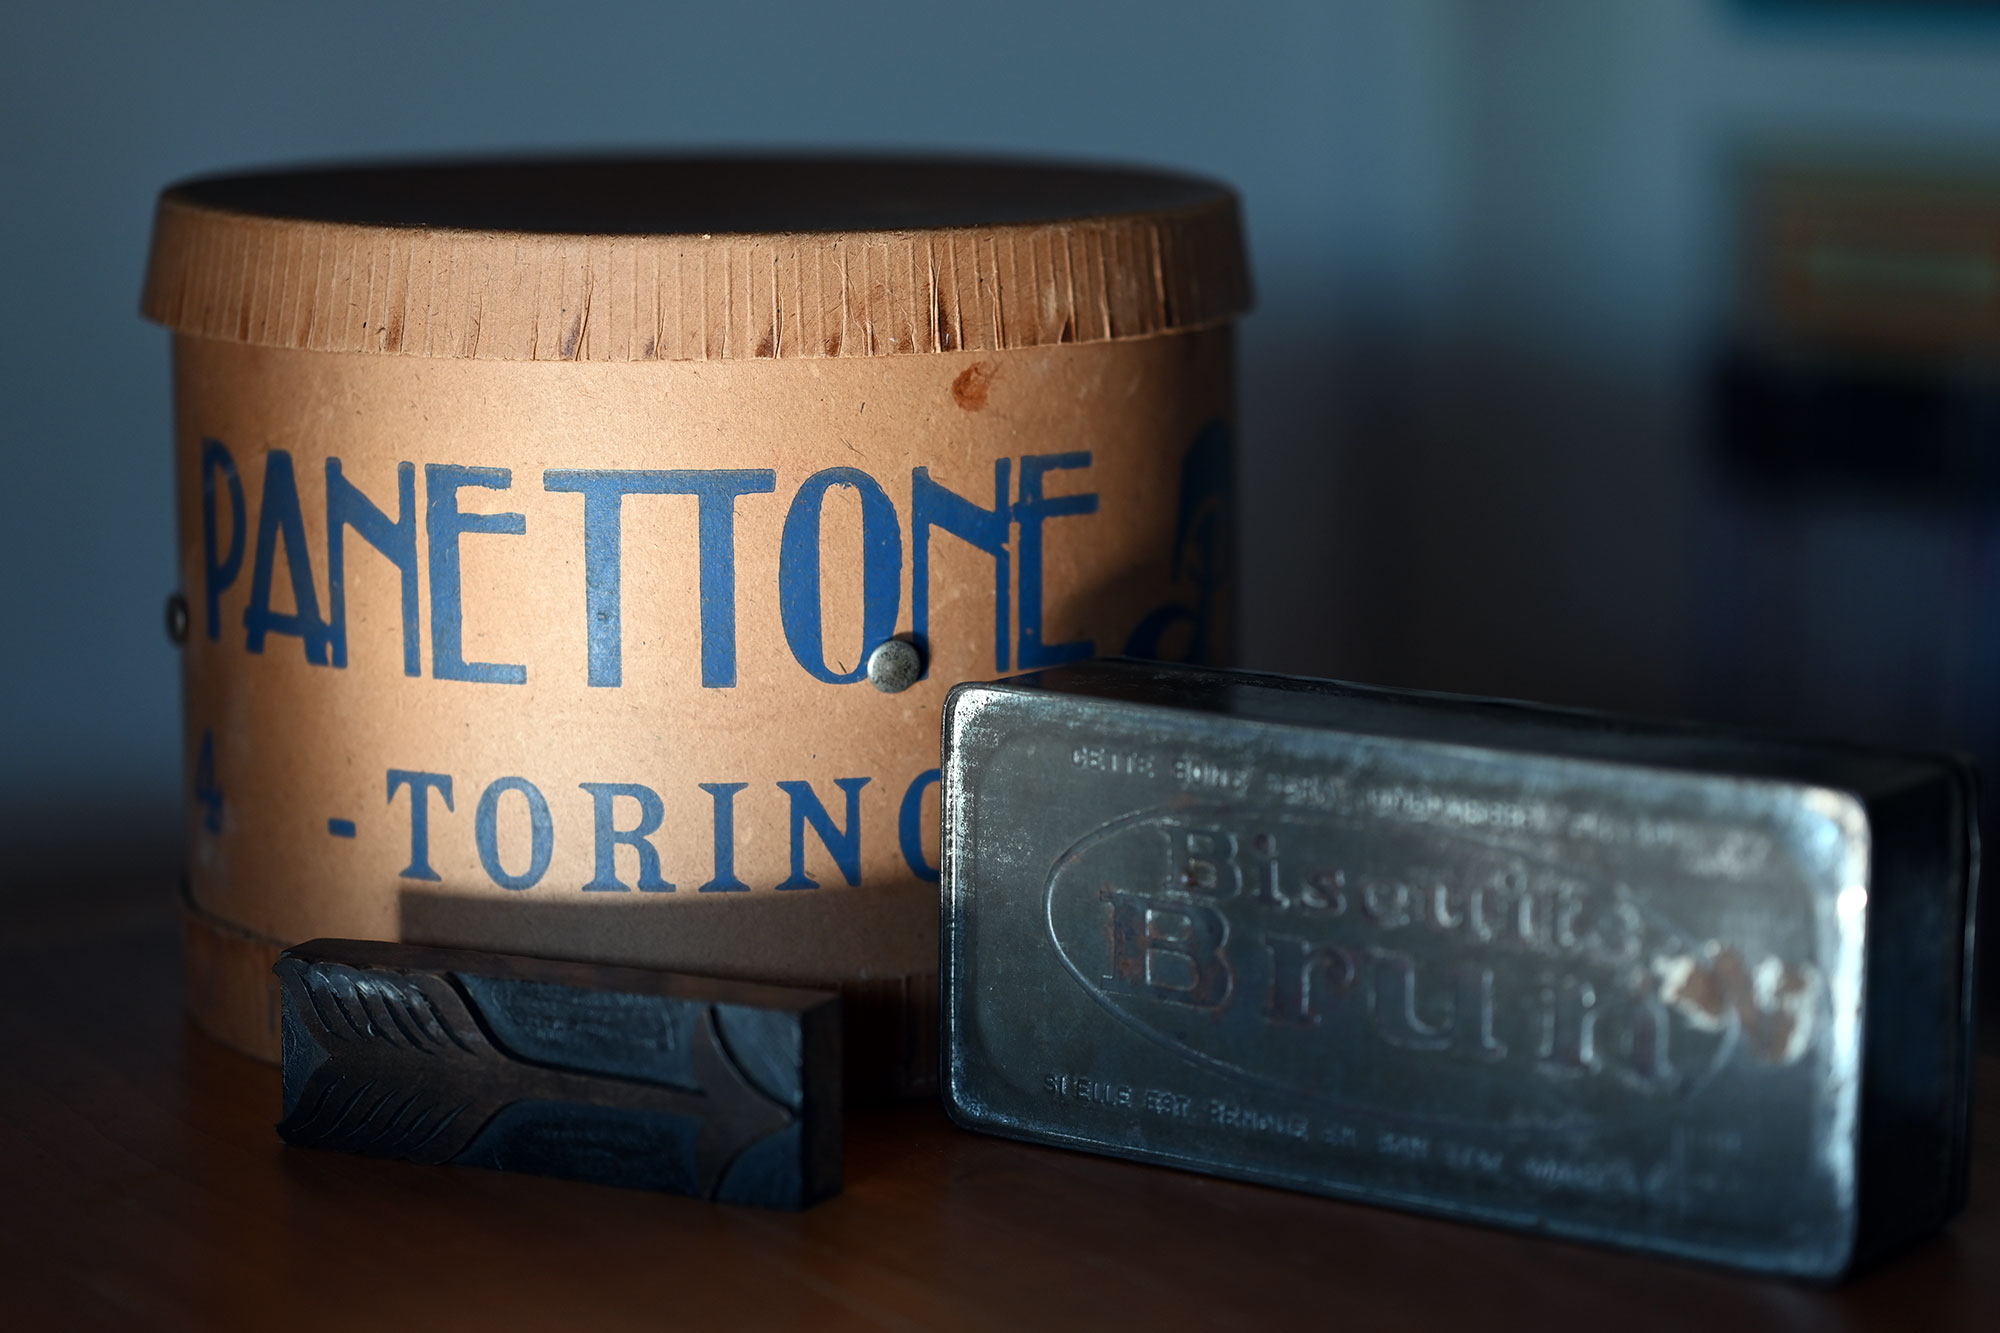 scatola vintage panettone